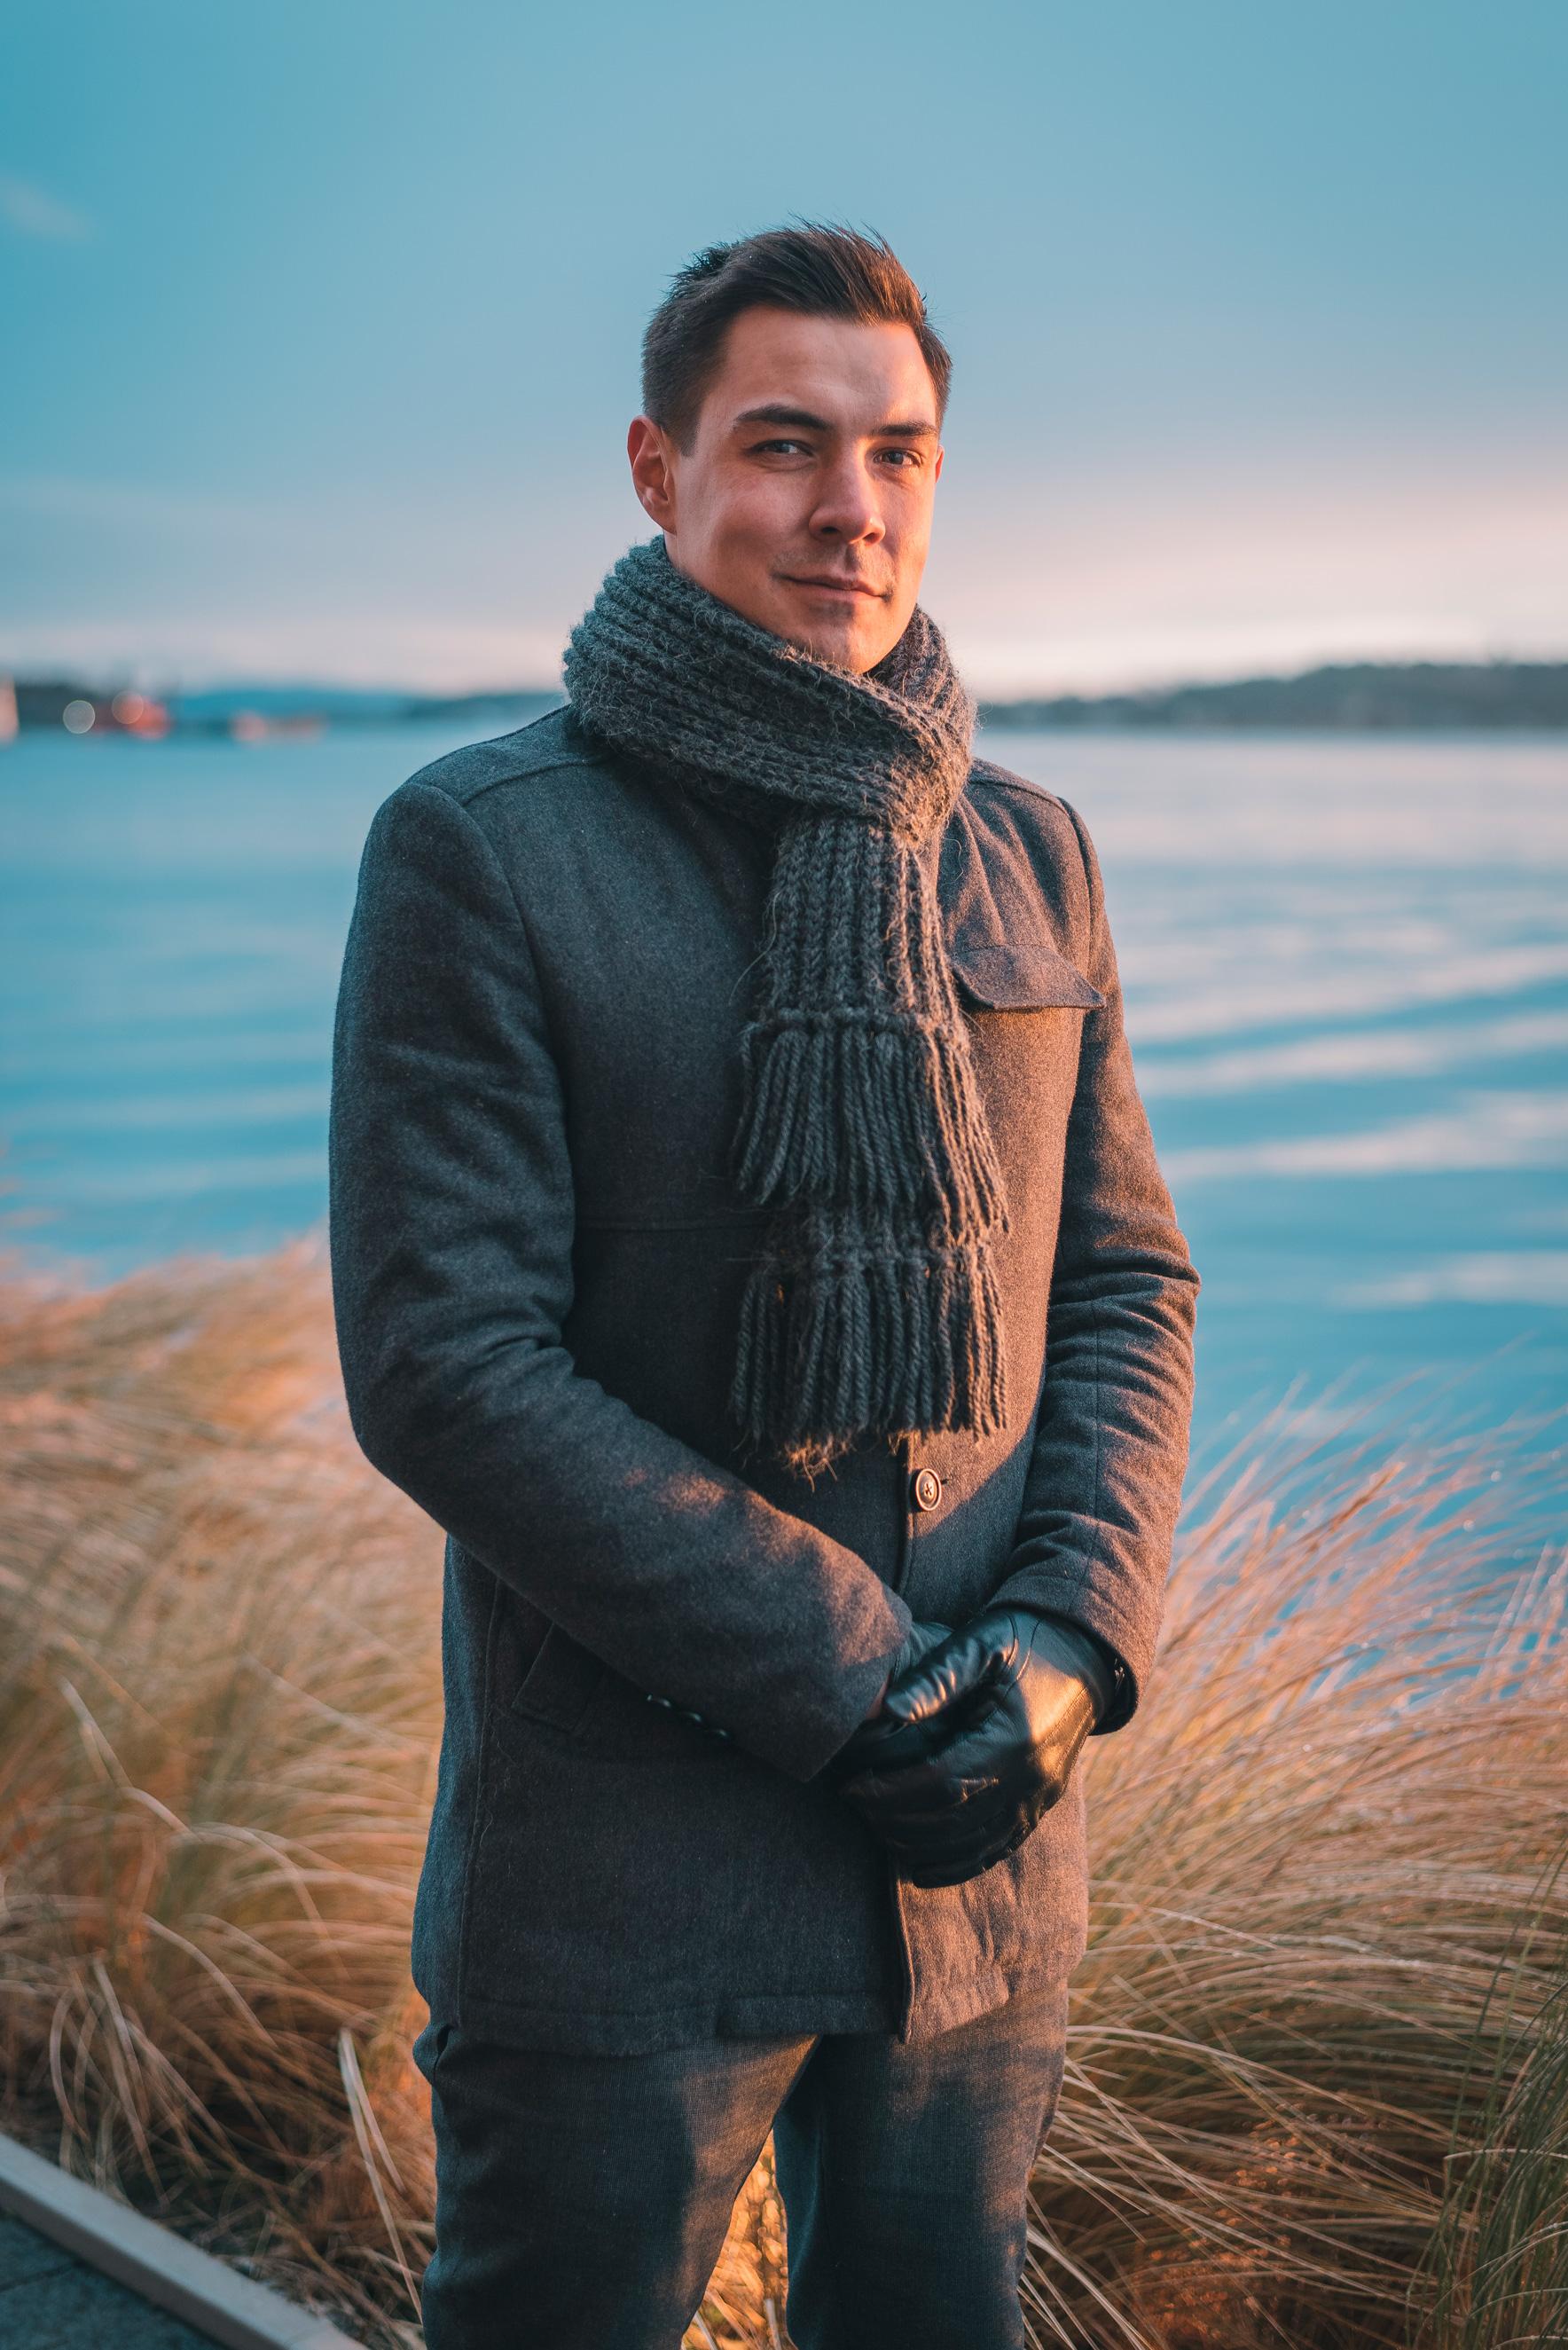 Bedriftsfotograf i Oslo